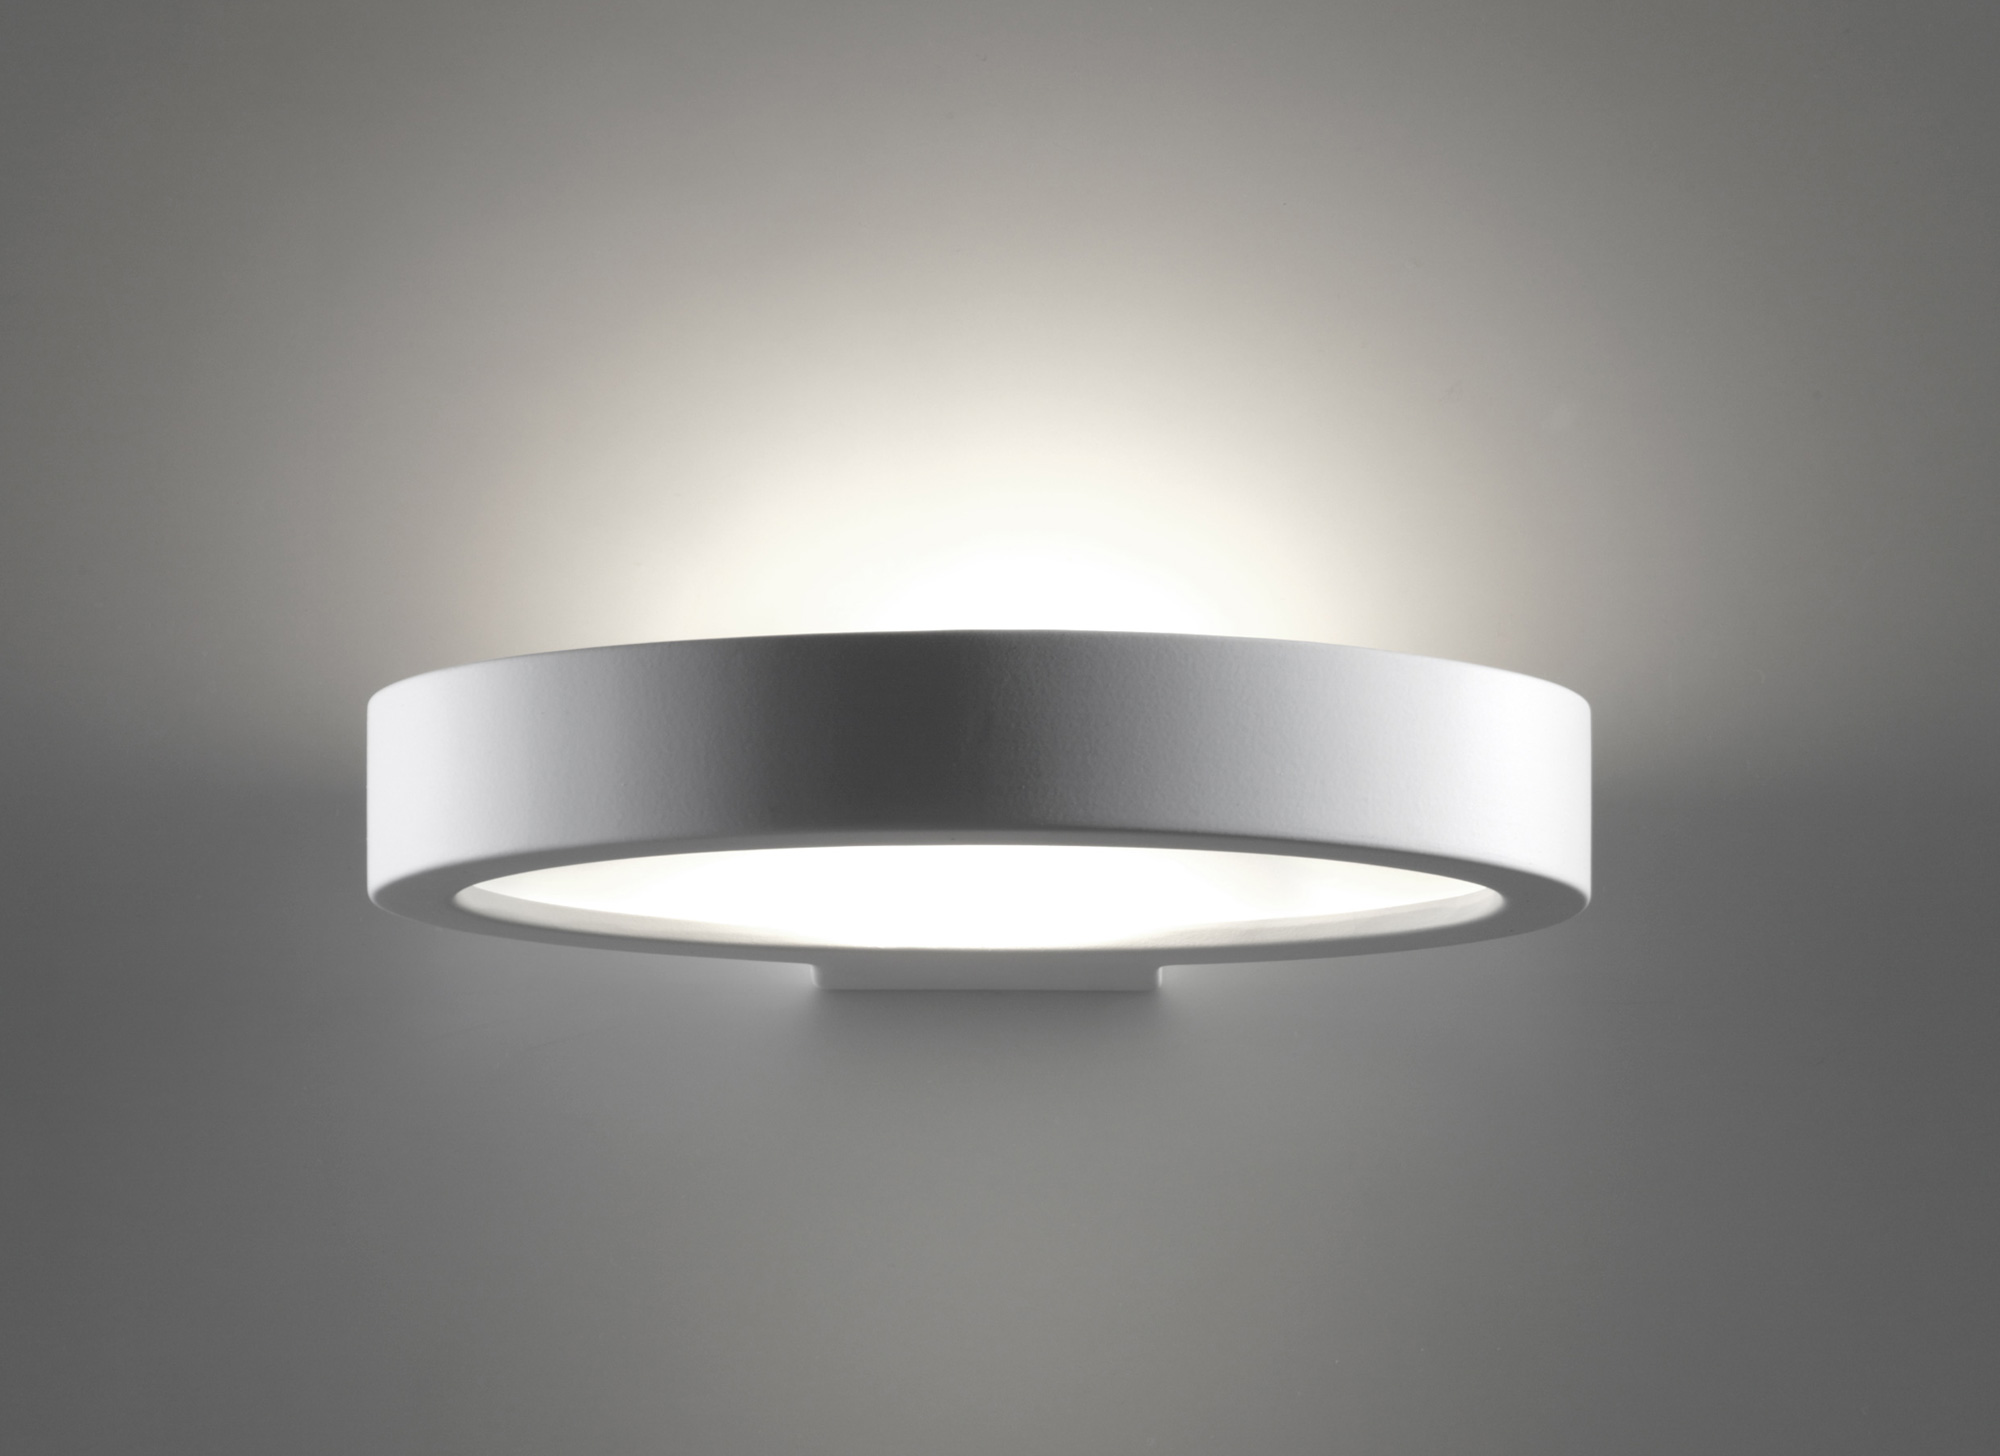 Applique in gesso belfiore artemide lampade soffitto lampada in